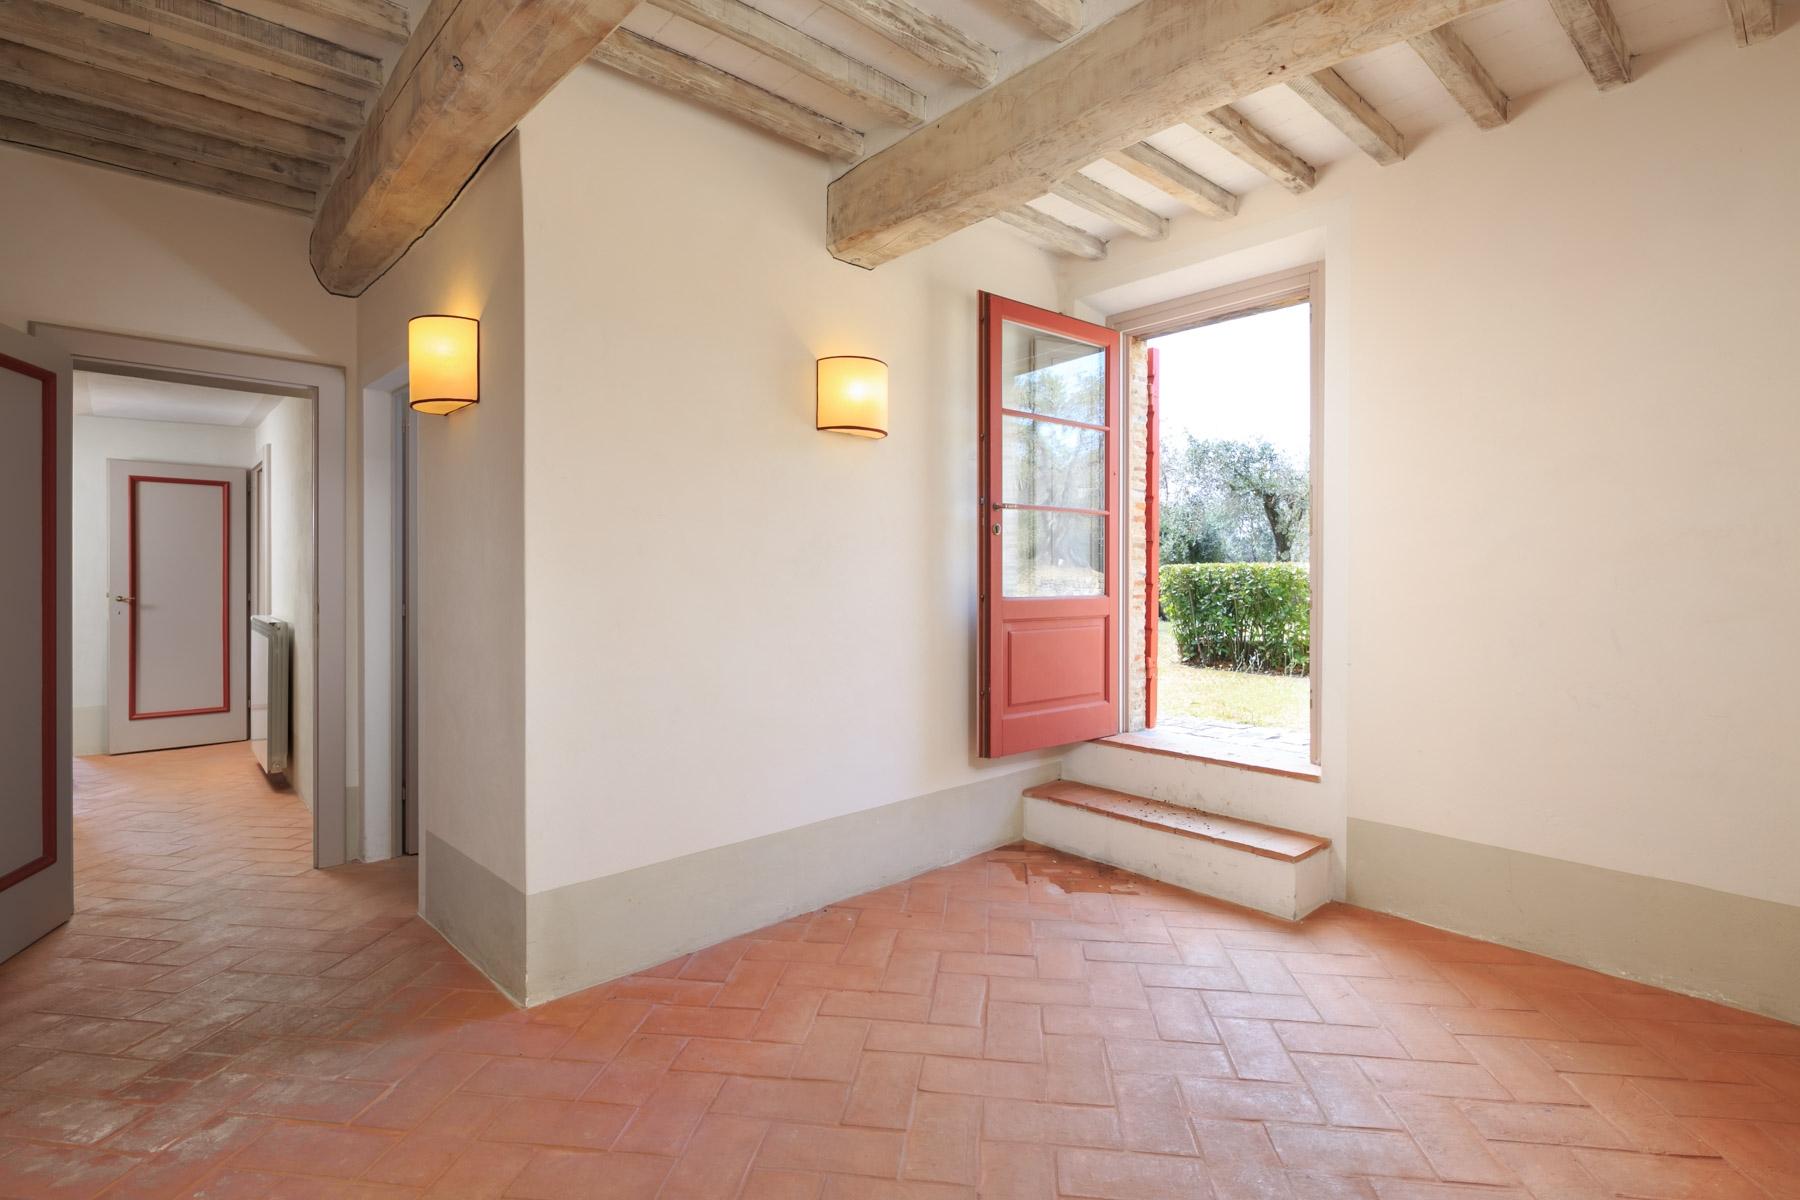 Villa in Vendita a Lucca: 5 locali, 225 mq - Foto 7